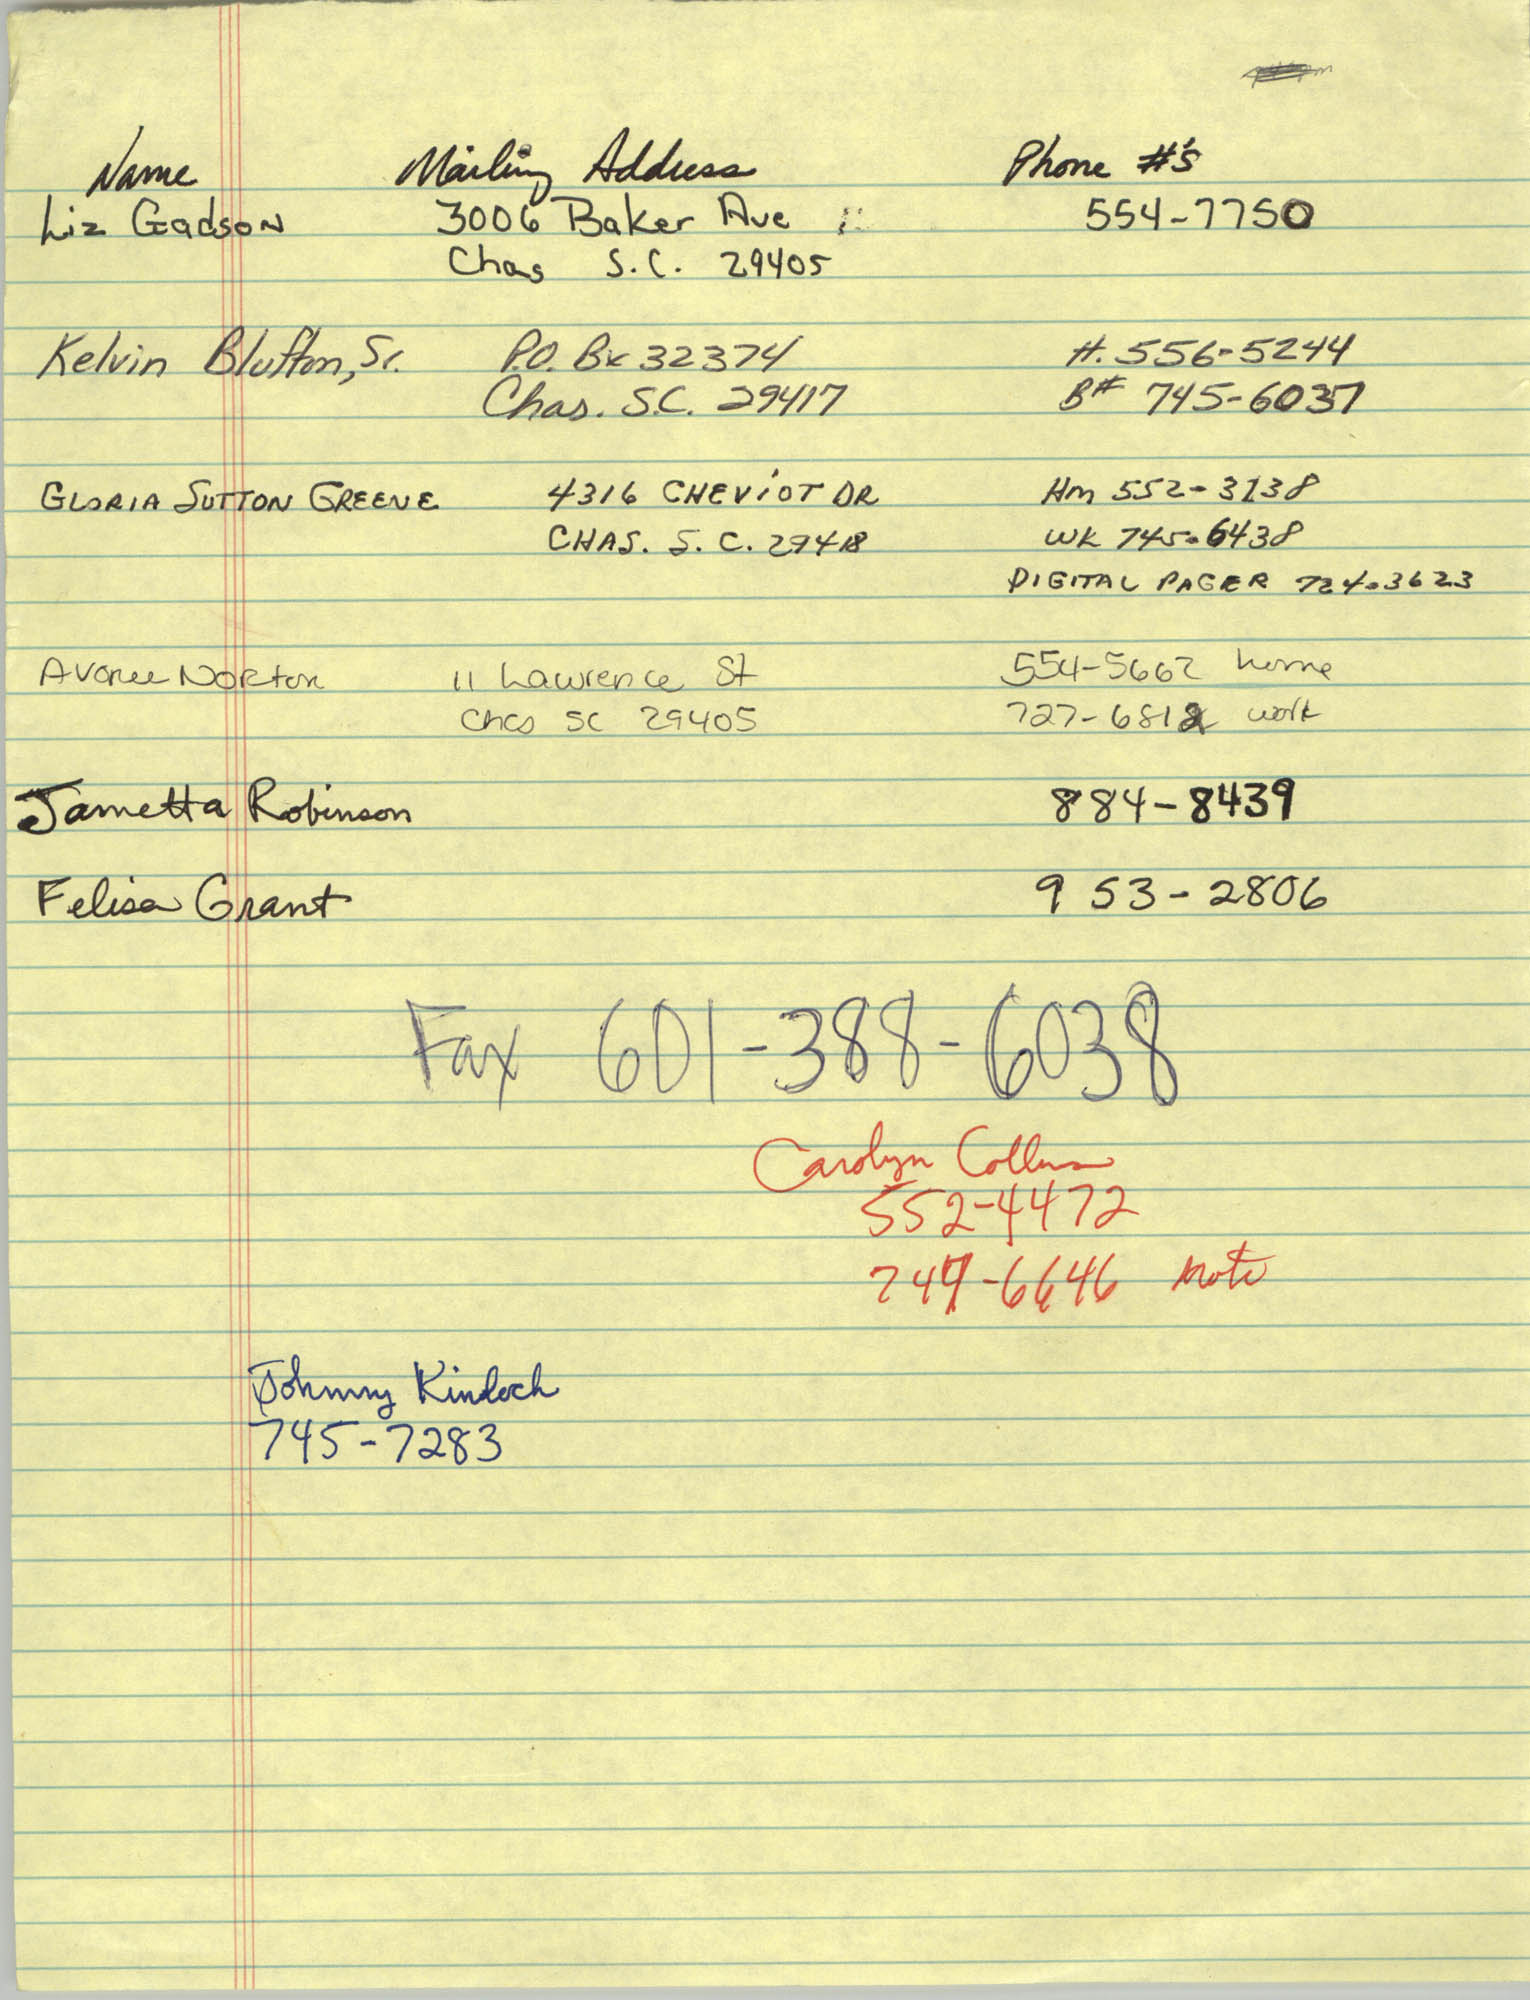 Handwritten Contact Information